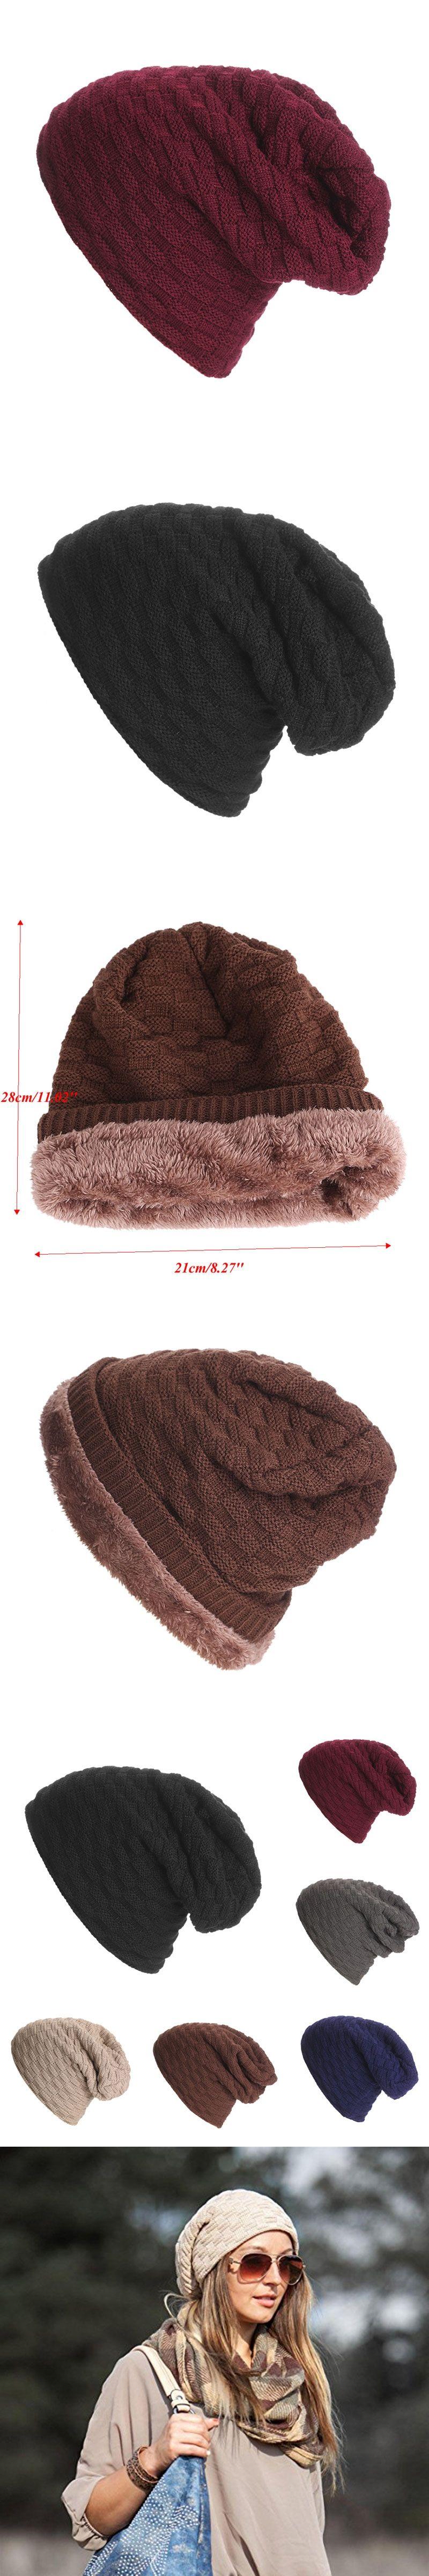 4d4378548adec Men Women Crochet Knit Plicate Baggy Beanie velvet Hat Skull Winter Warm  HipHop Cap